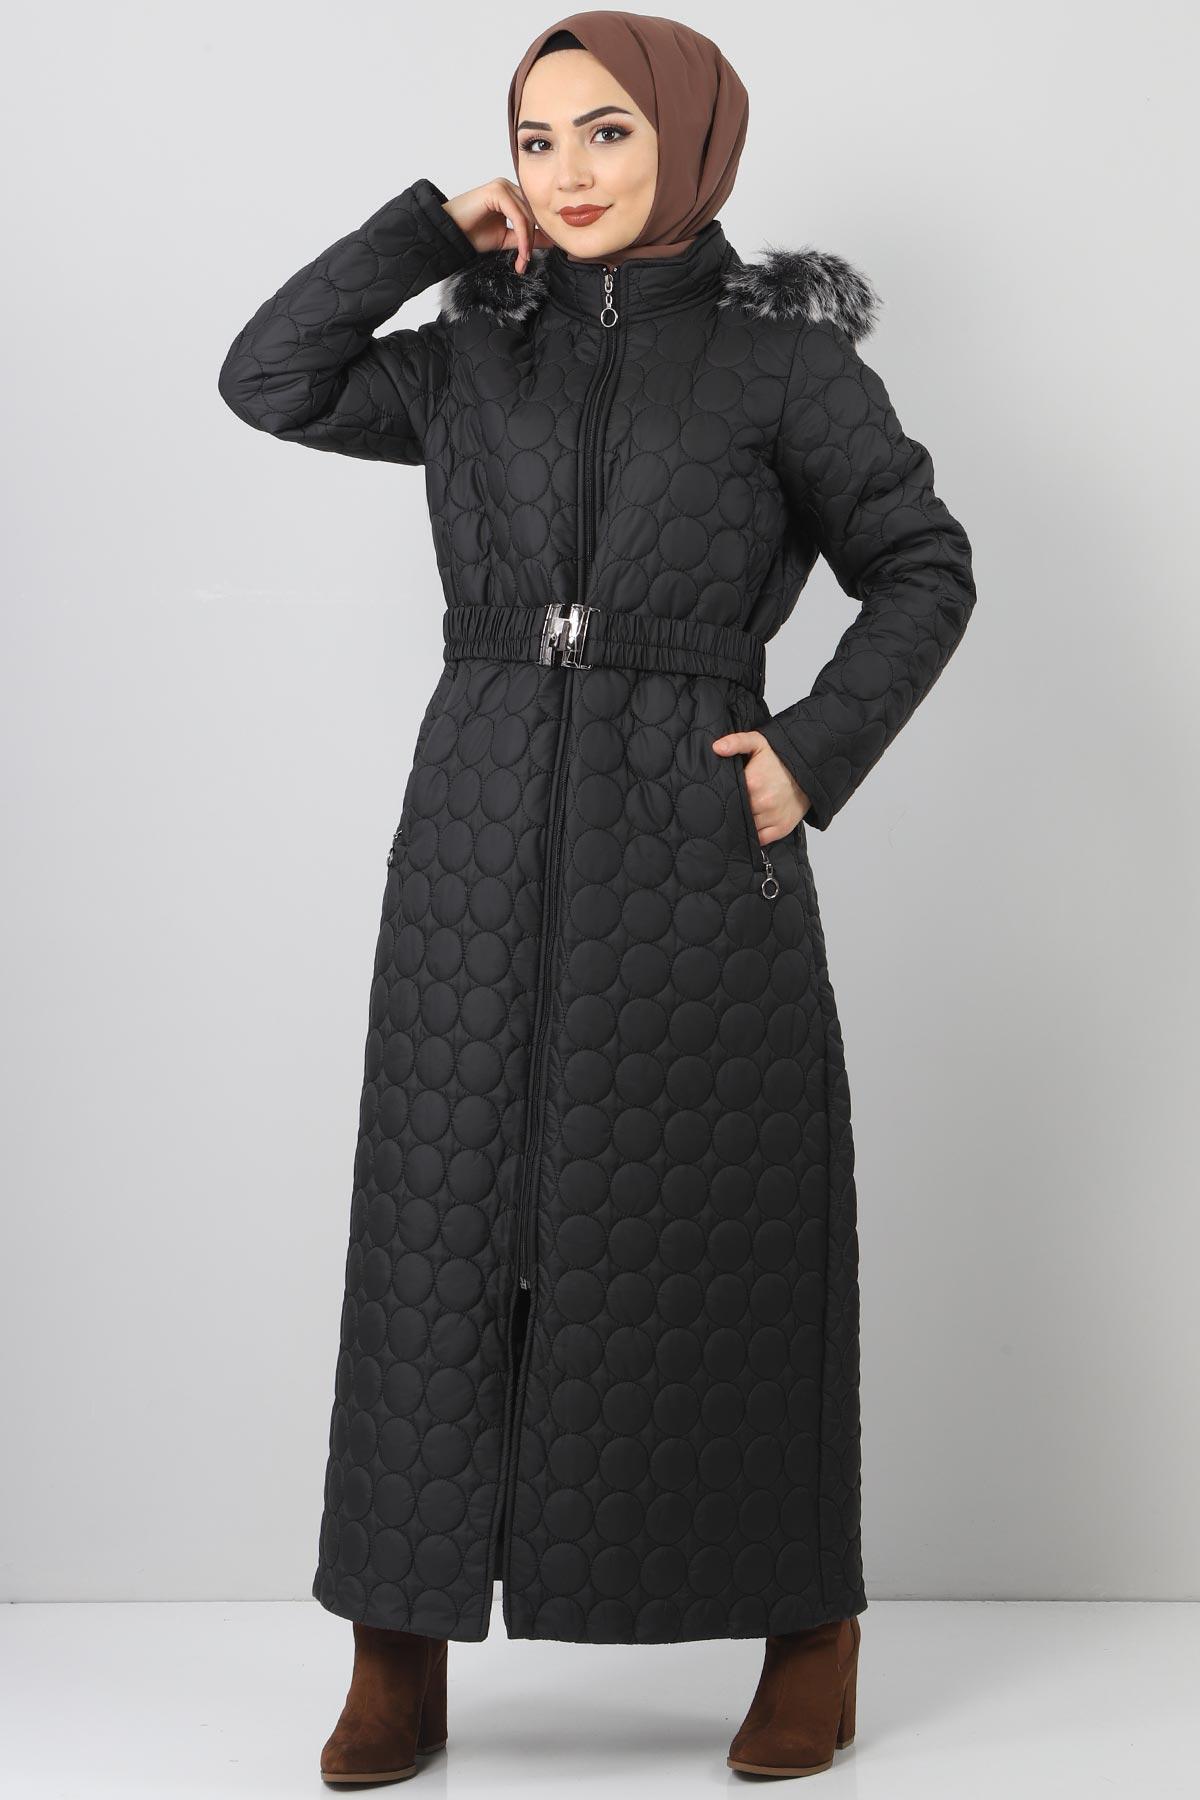 معطف مبطن أسود مقاس كبير نسائي